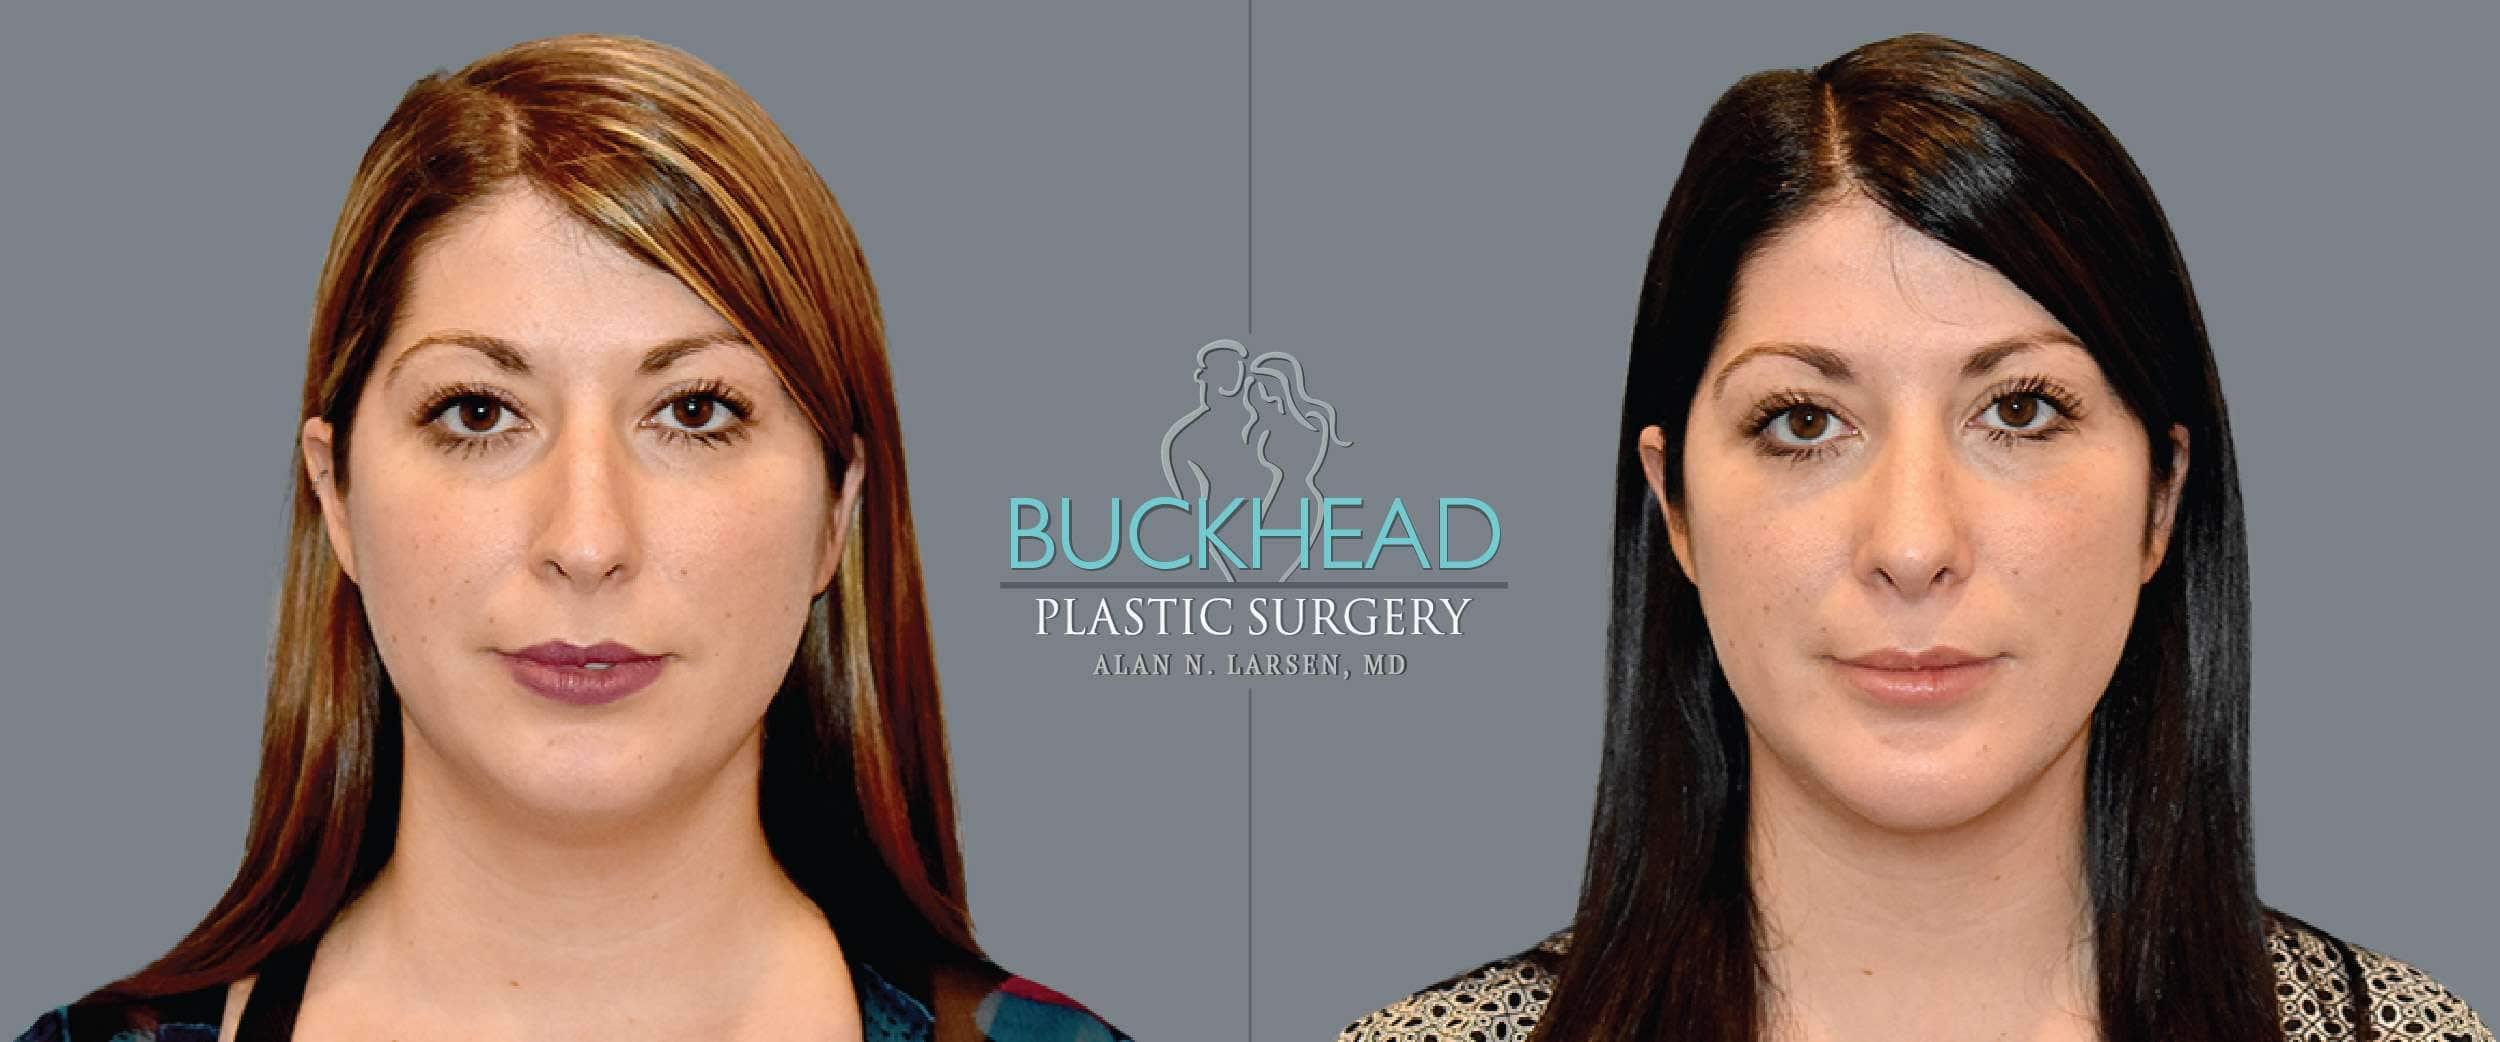 Before and After Photo gallery | Brazilian Butt Lift | Buckhead Plastic Surgery | Board-Certified Plastic Surgeon in Atlanta GA